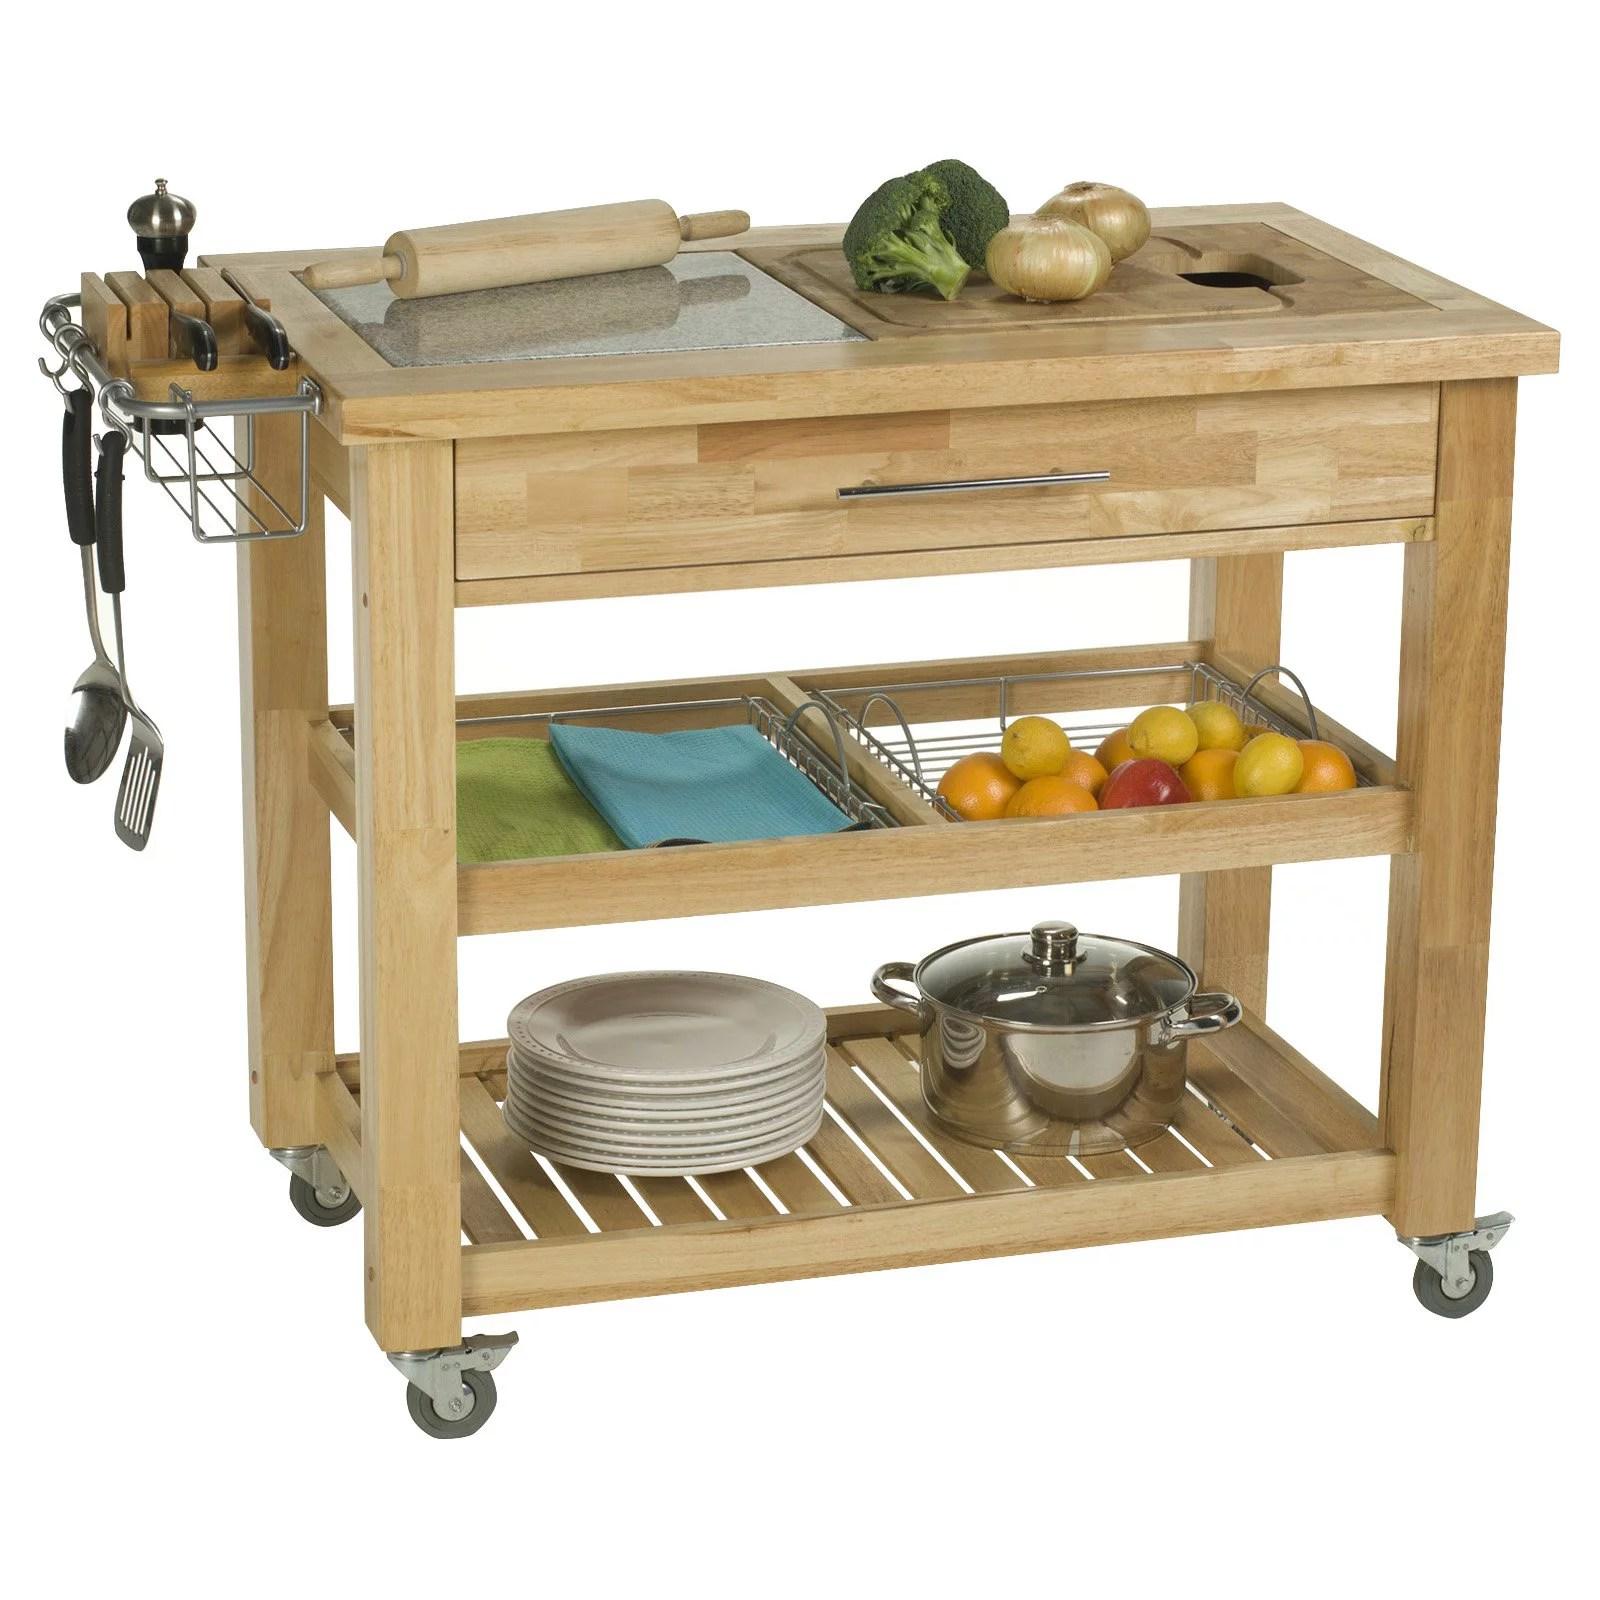 kitchen prep cart floor cleaner chris amp pro chef 24 x 40 food station natural walmart com